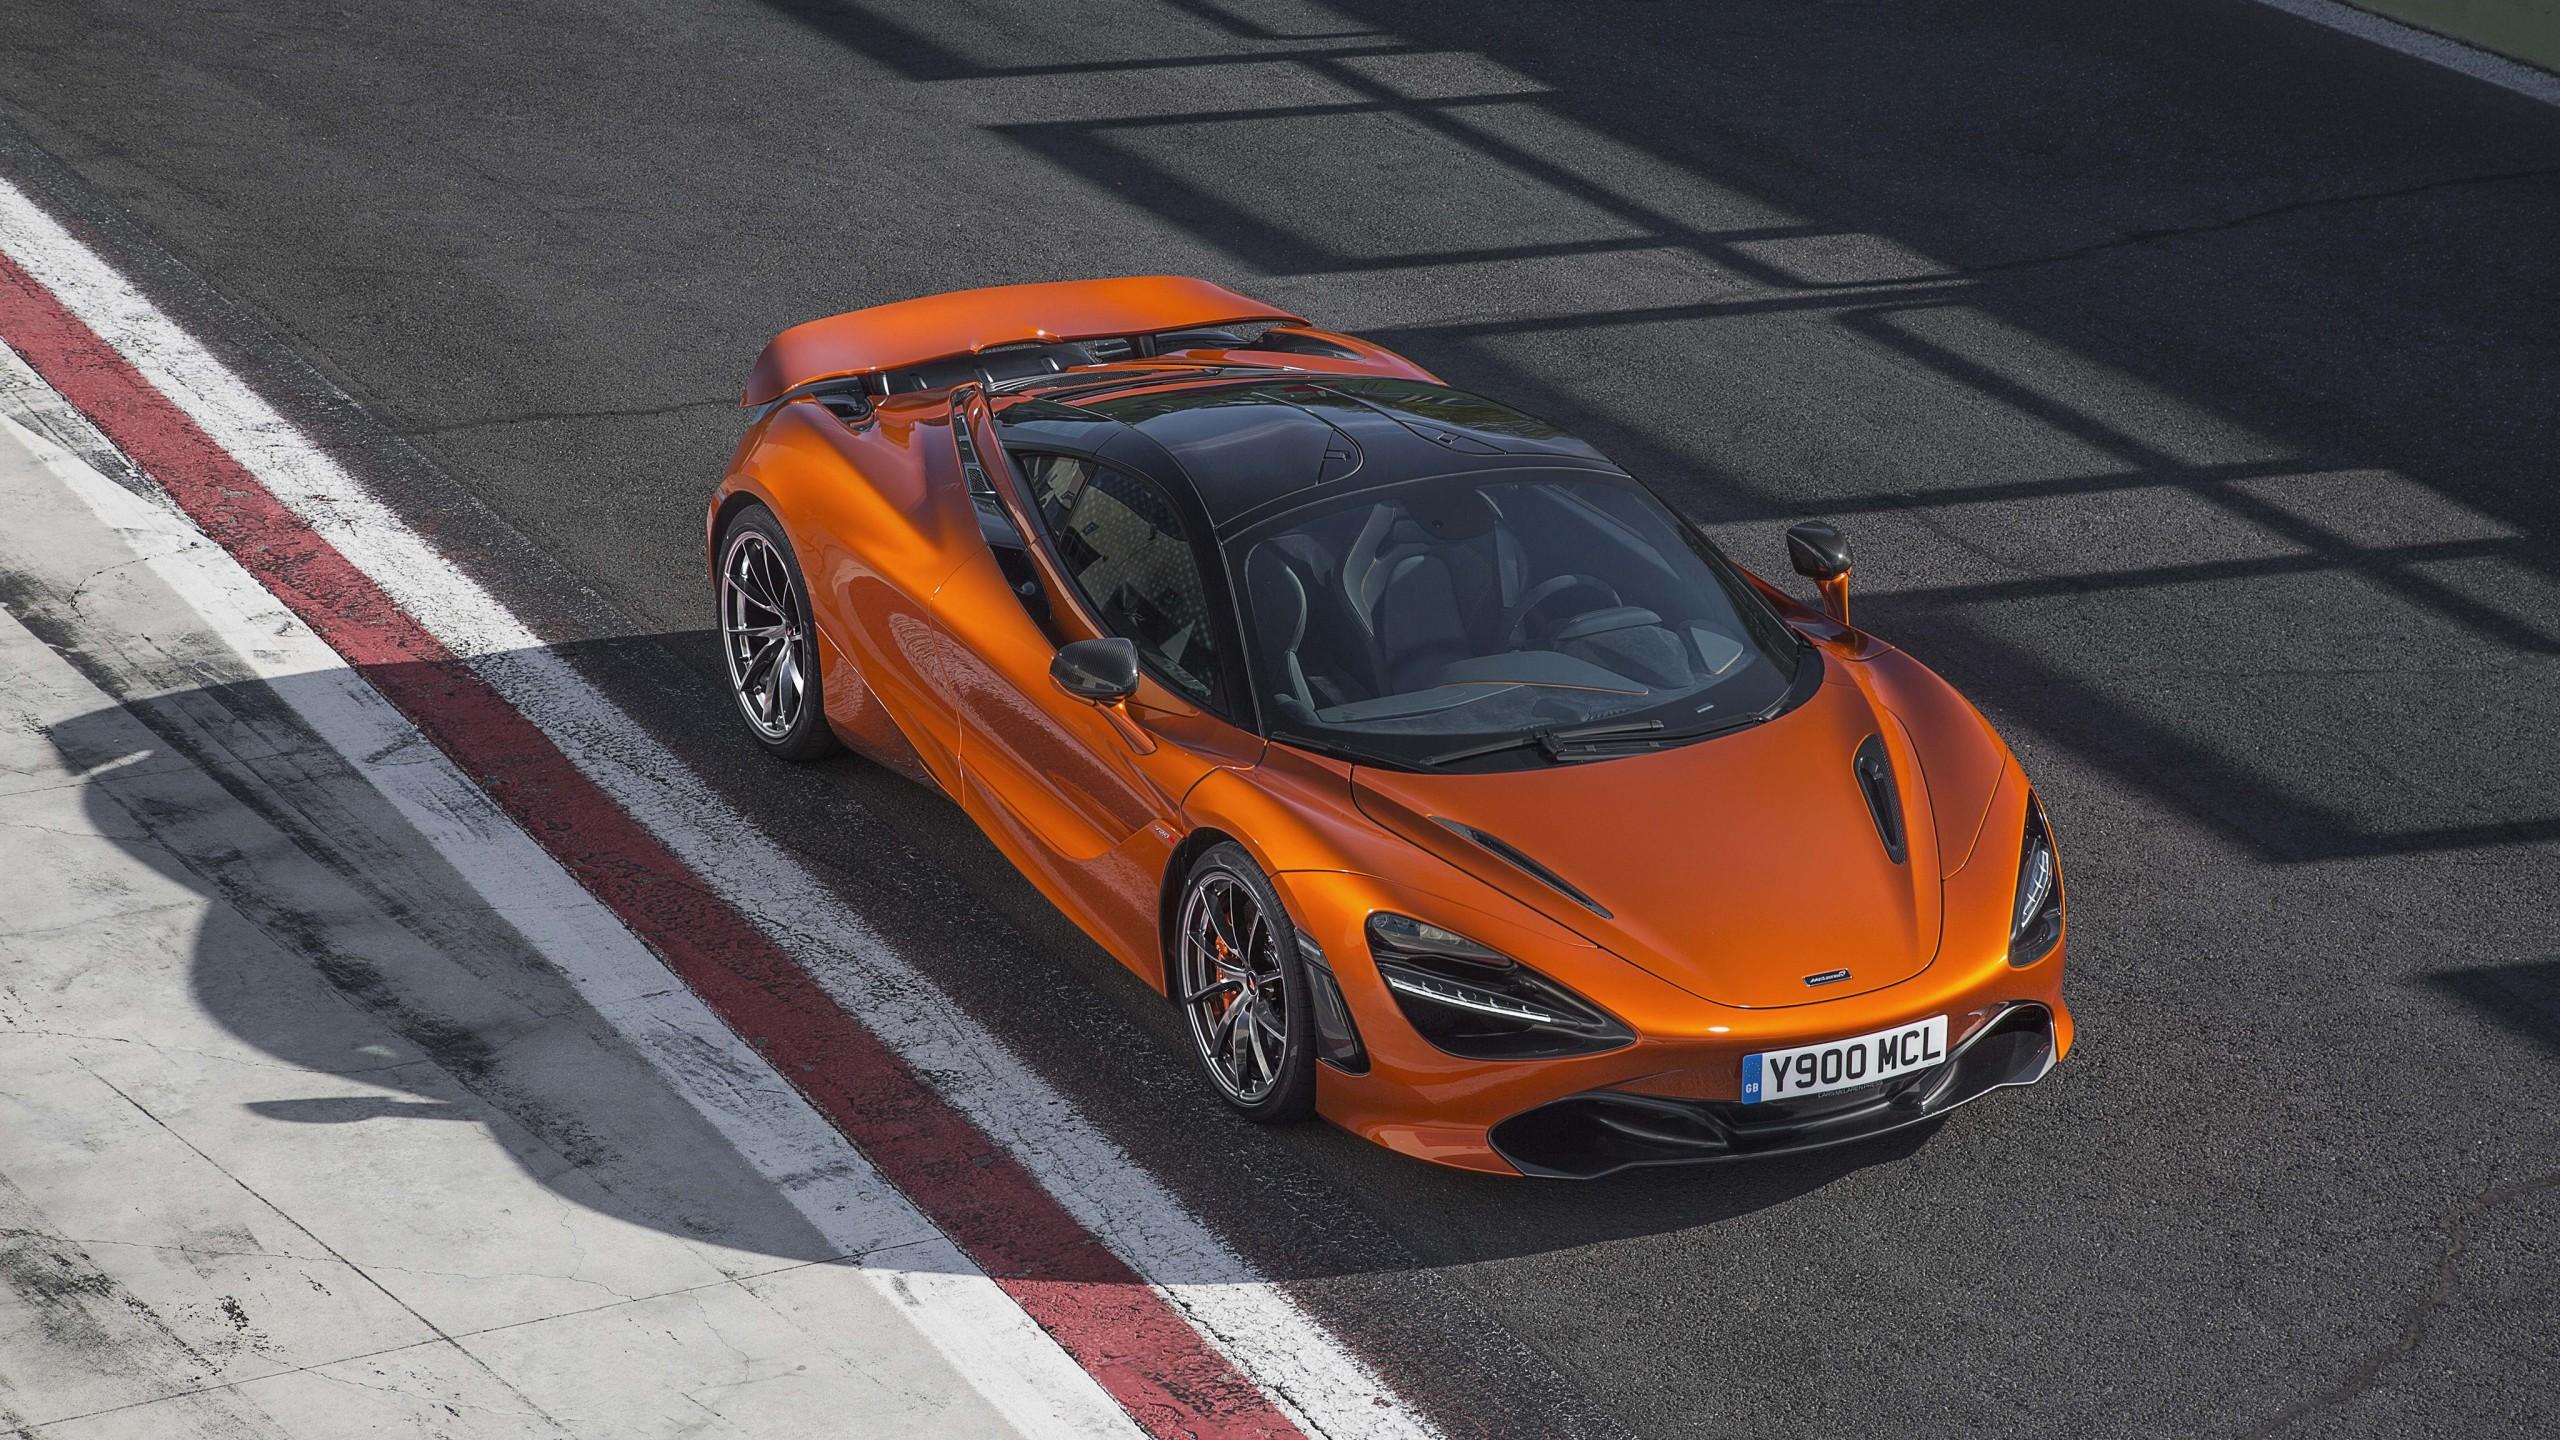 McLaren 720s Coupe 4K 2017 Wallpaper | HD Car Wallpapers ...